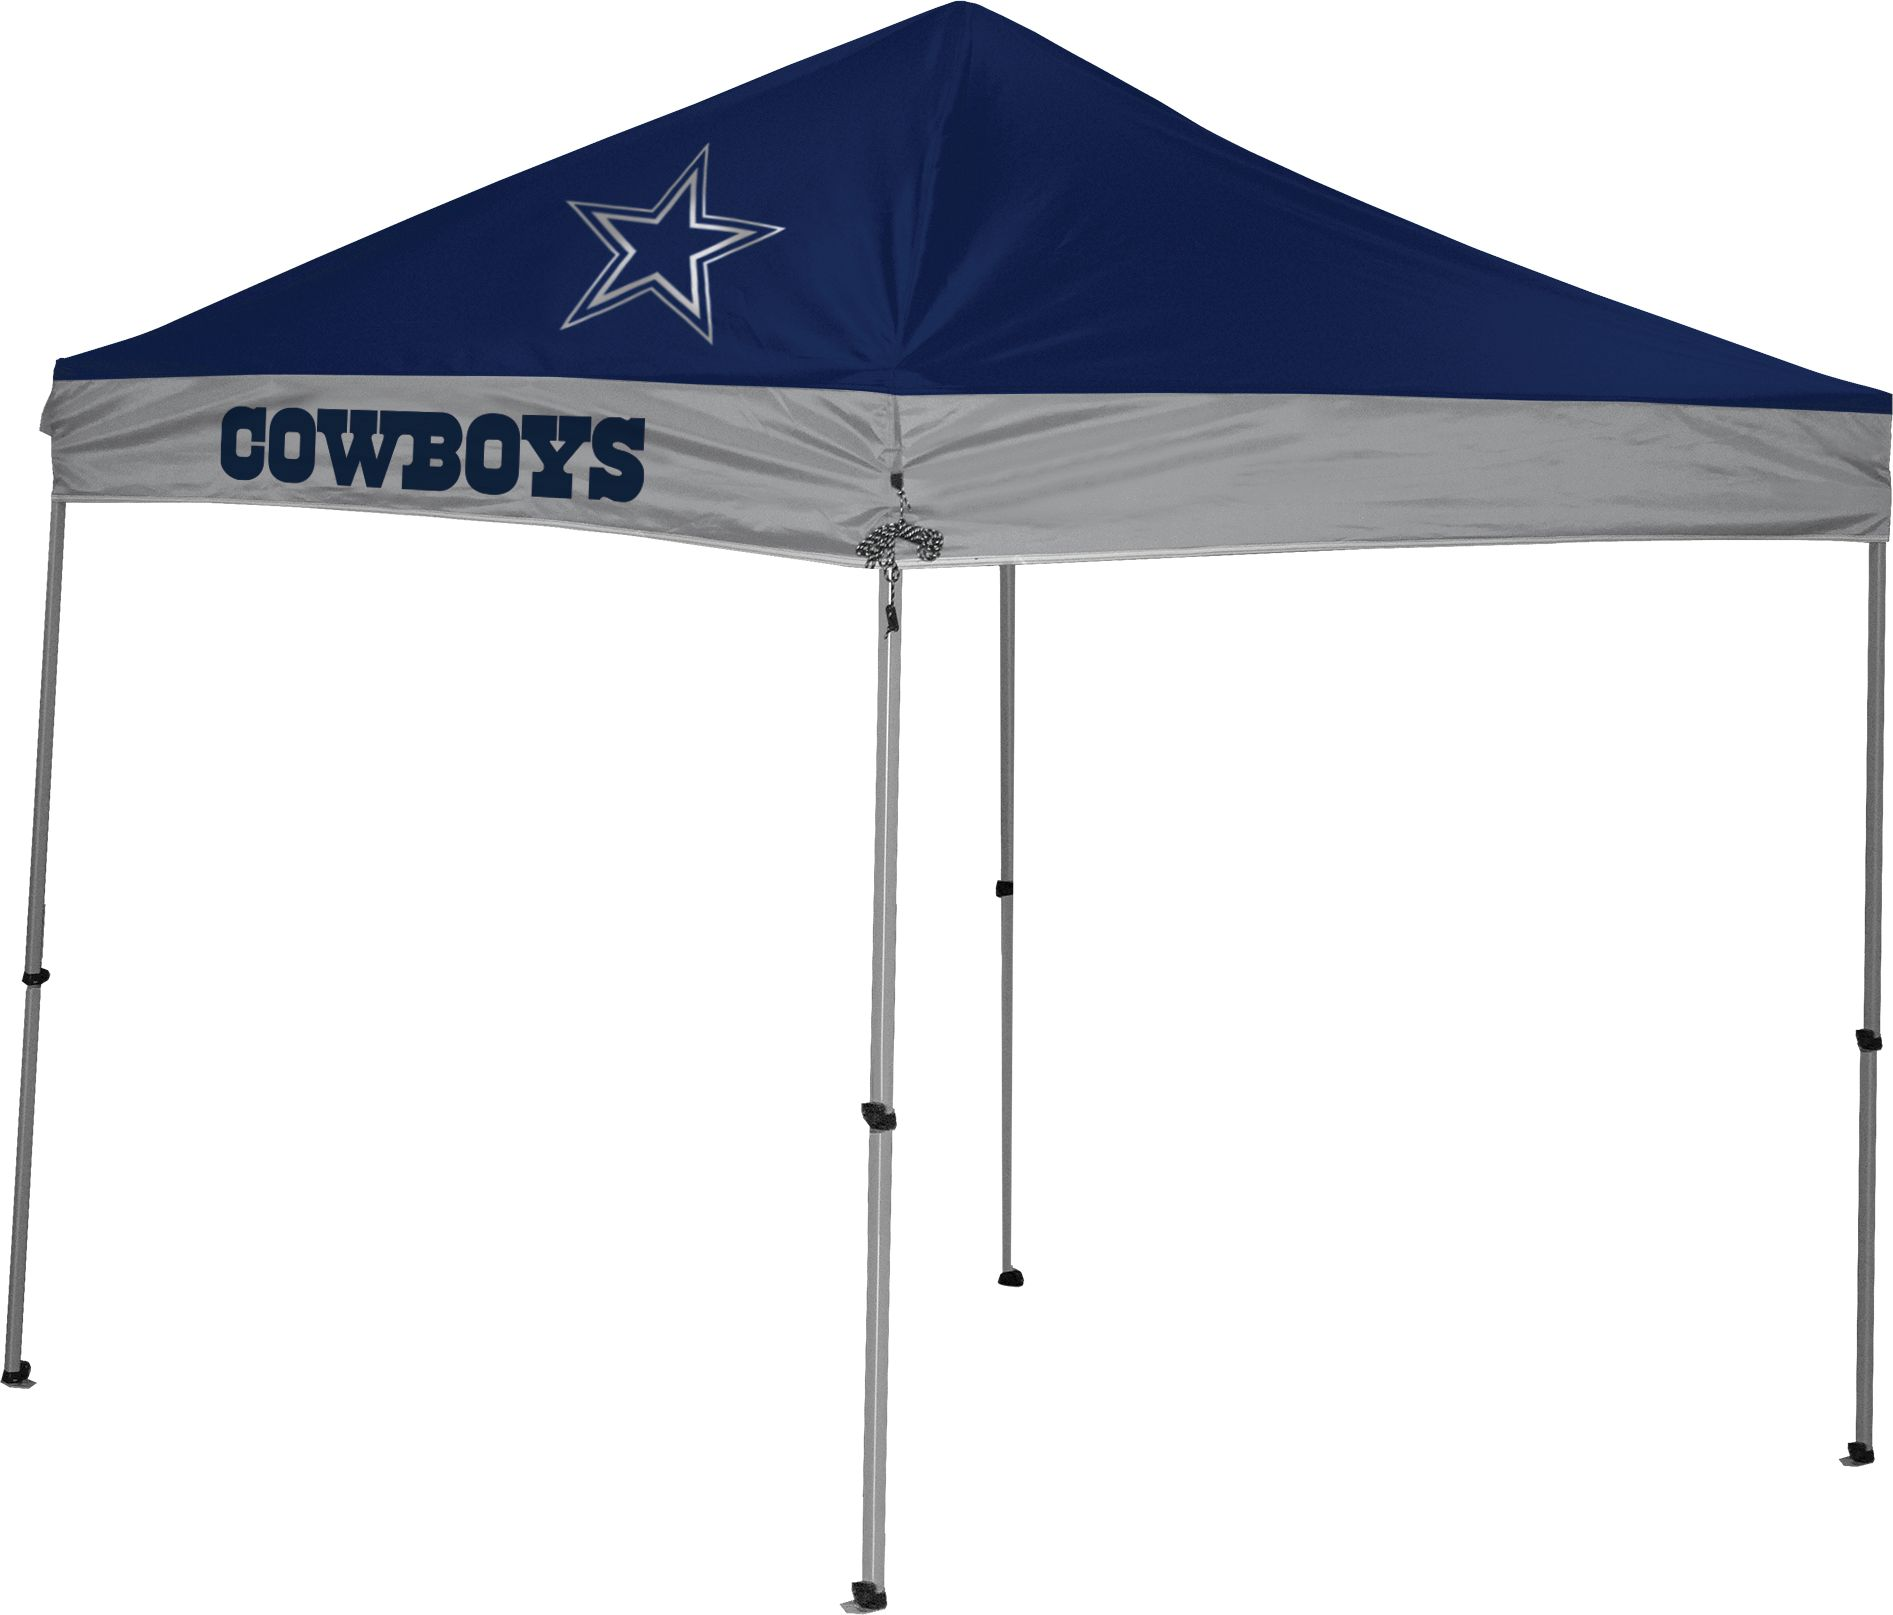 noImageFound ???  sc 1 st  DICKu0027S Sporting Goods & Rawlings Dallas Cowboys 9u0027x9u0027 Canopy Tent | DICKu0027S Sporting Goods